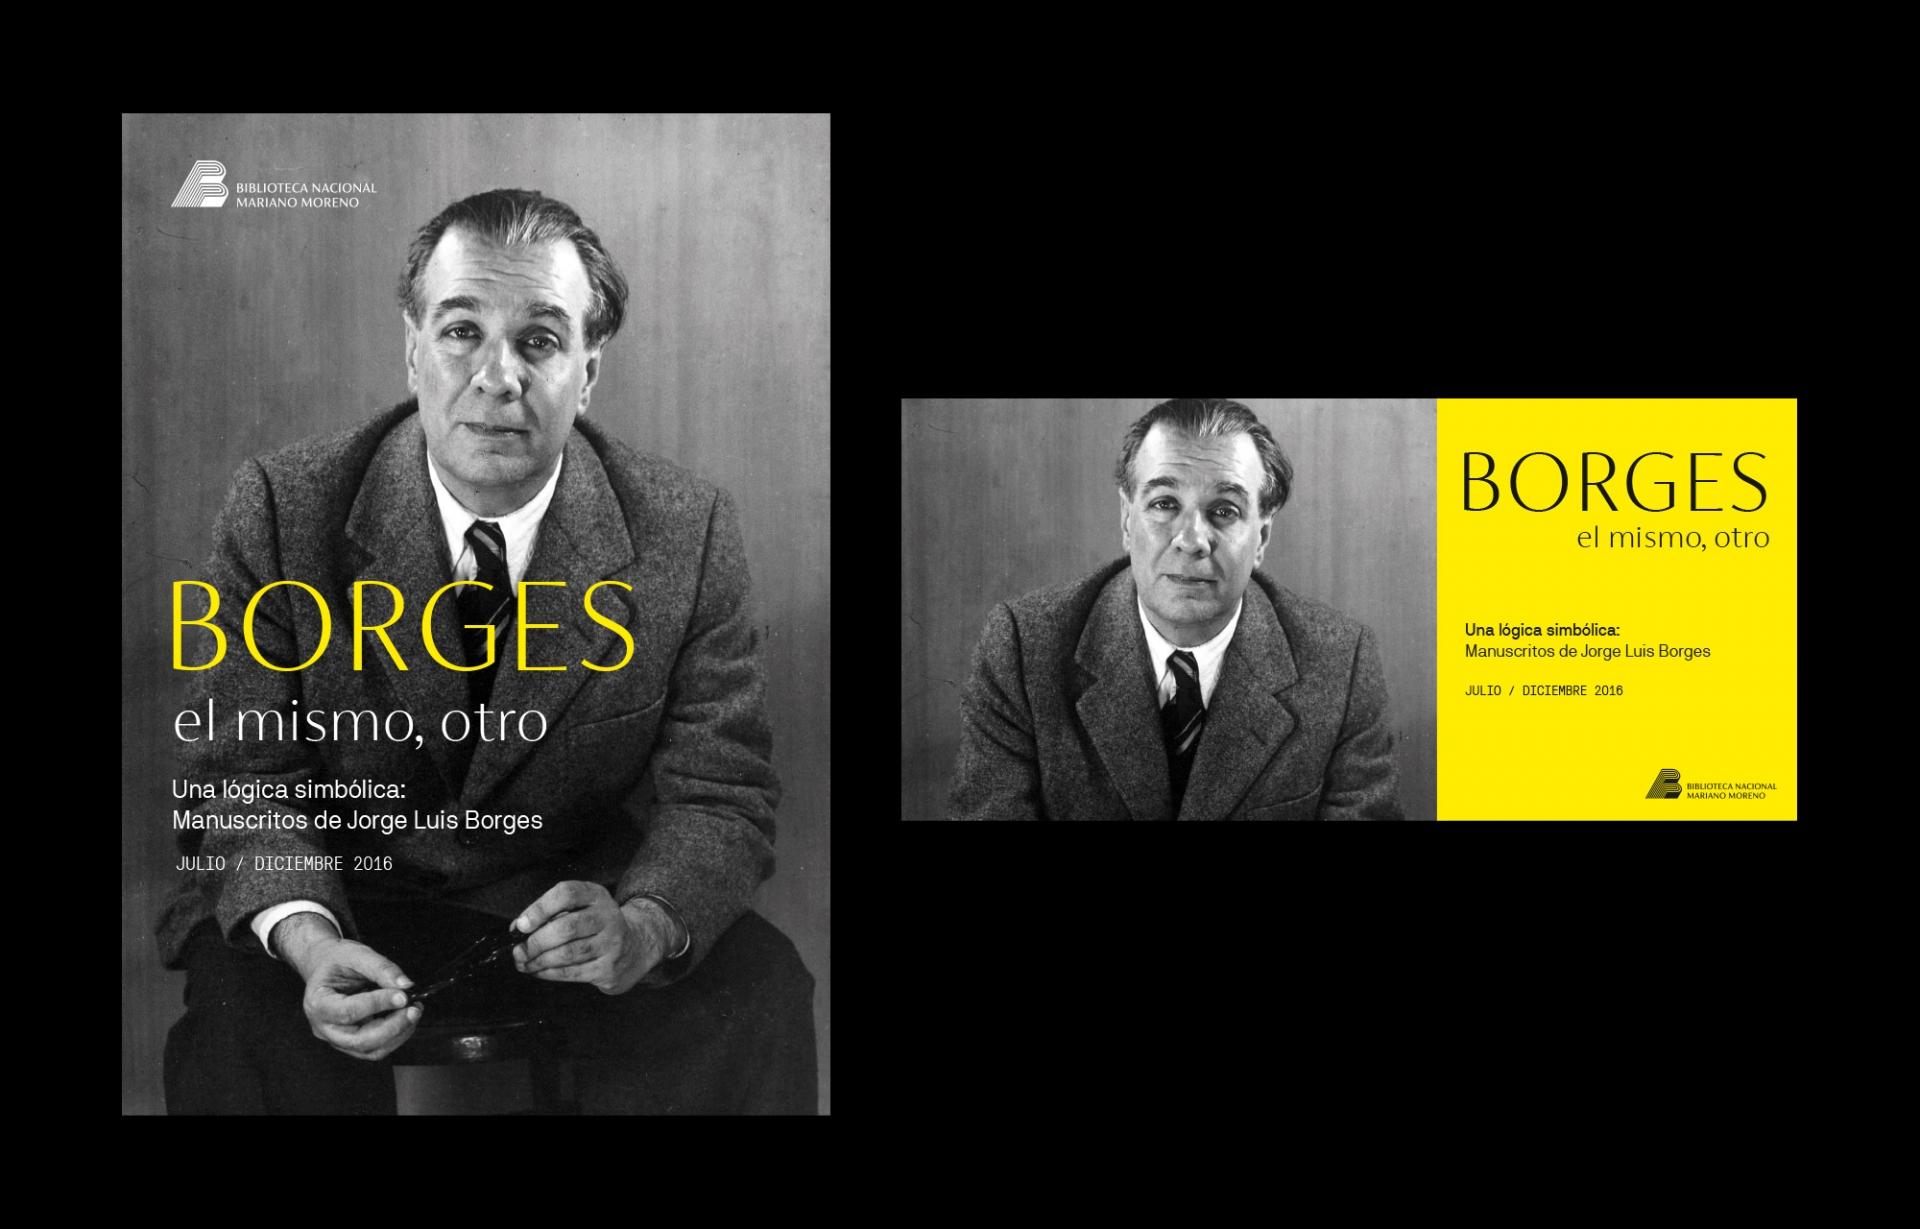 HORACIO LORENTE — Art Director Biblioteca Nacional ∎